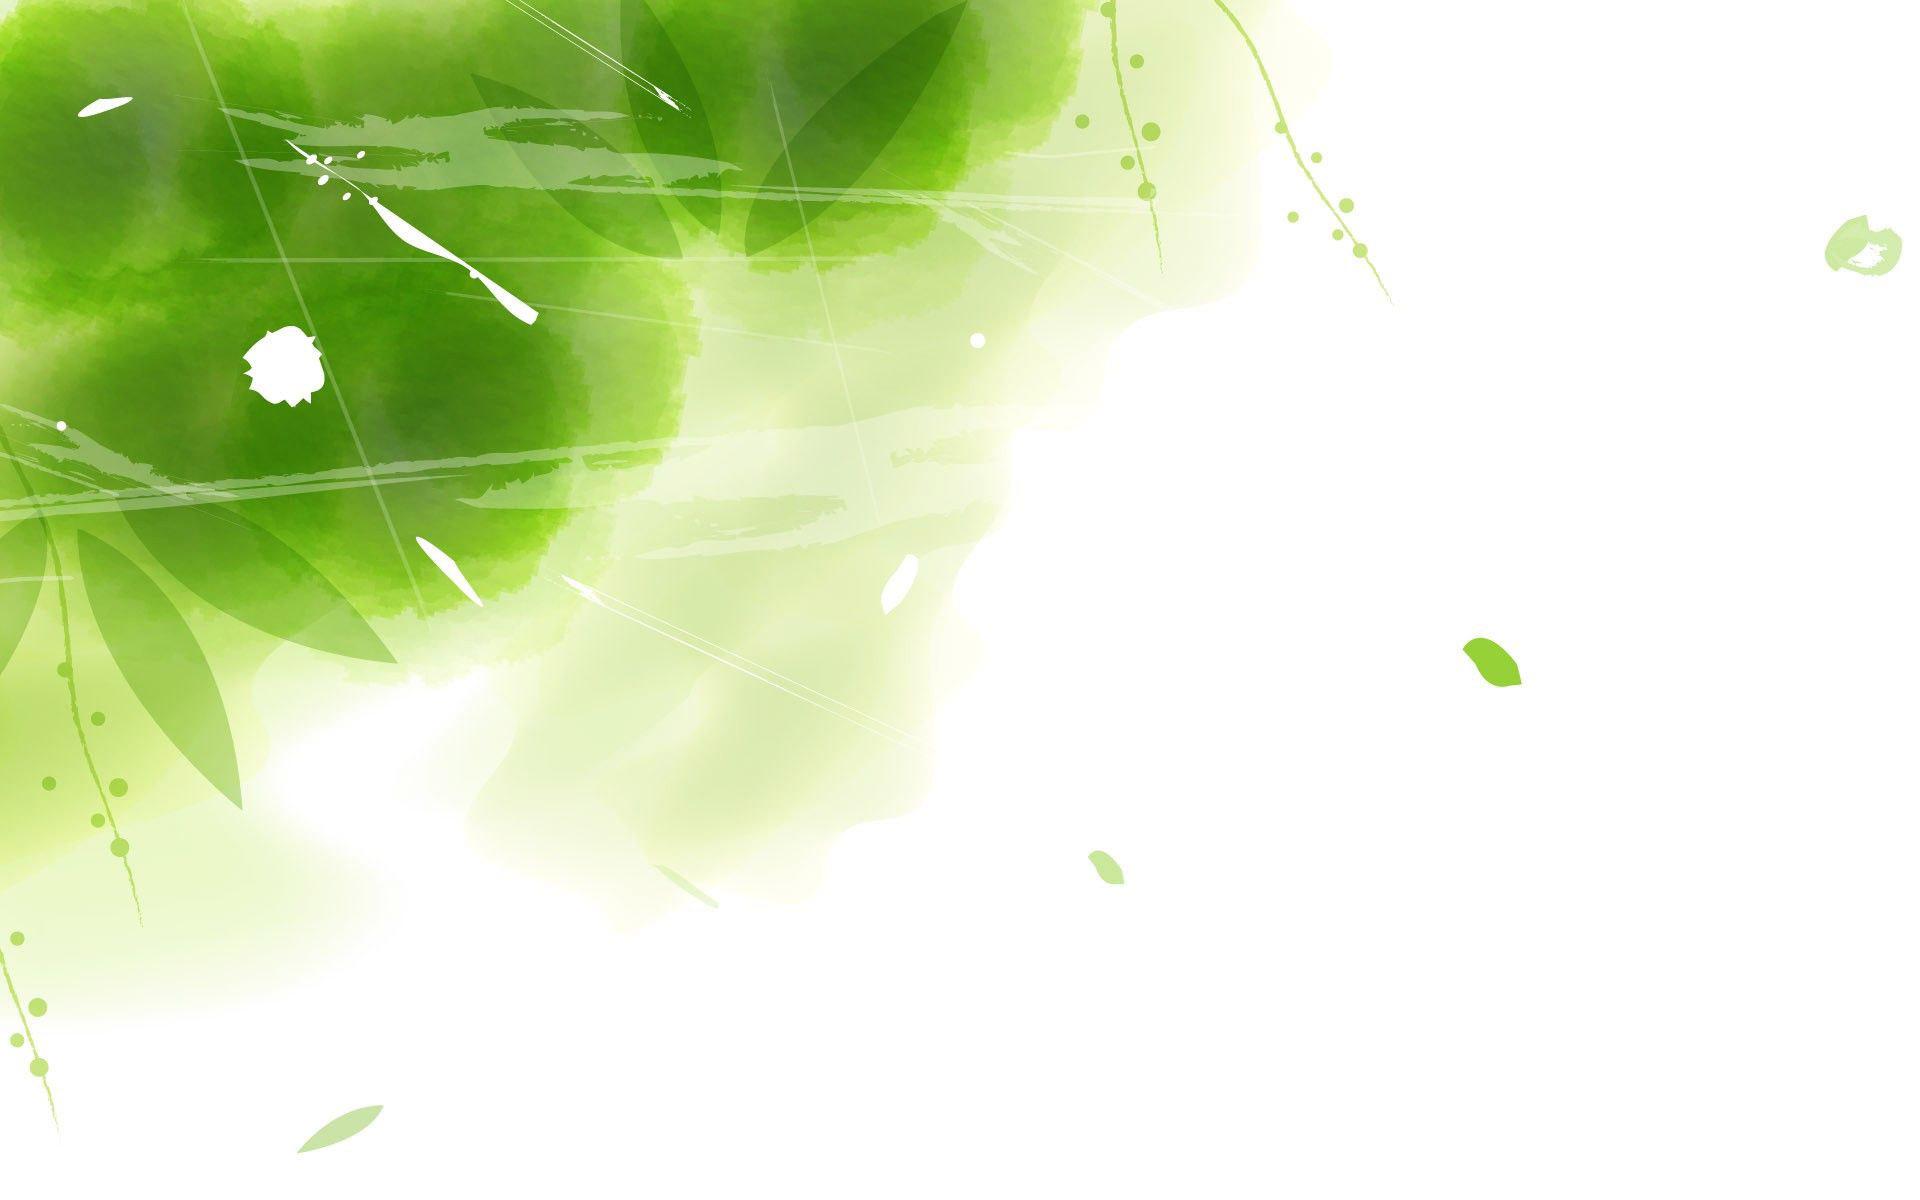 Falling green leaves wallpaper 13591 1920x1200